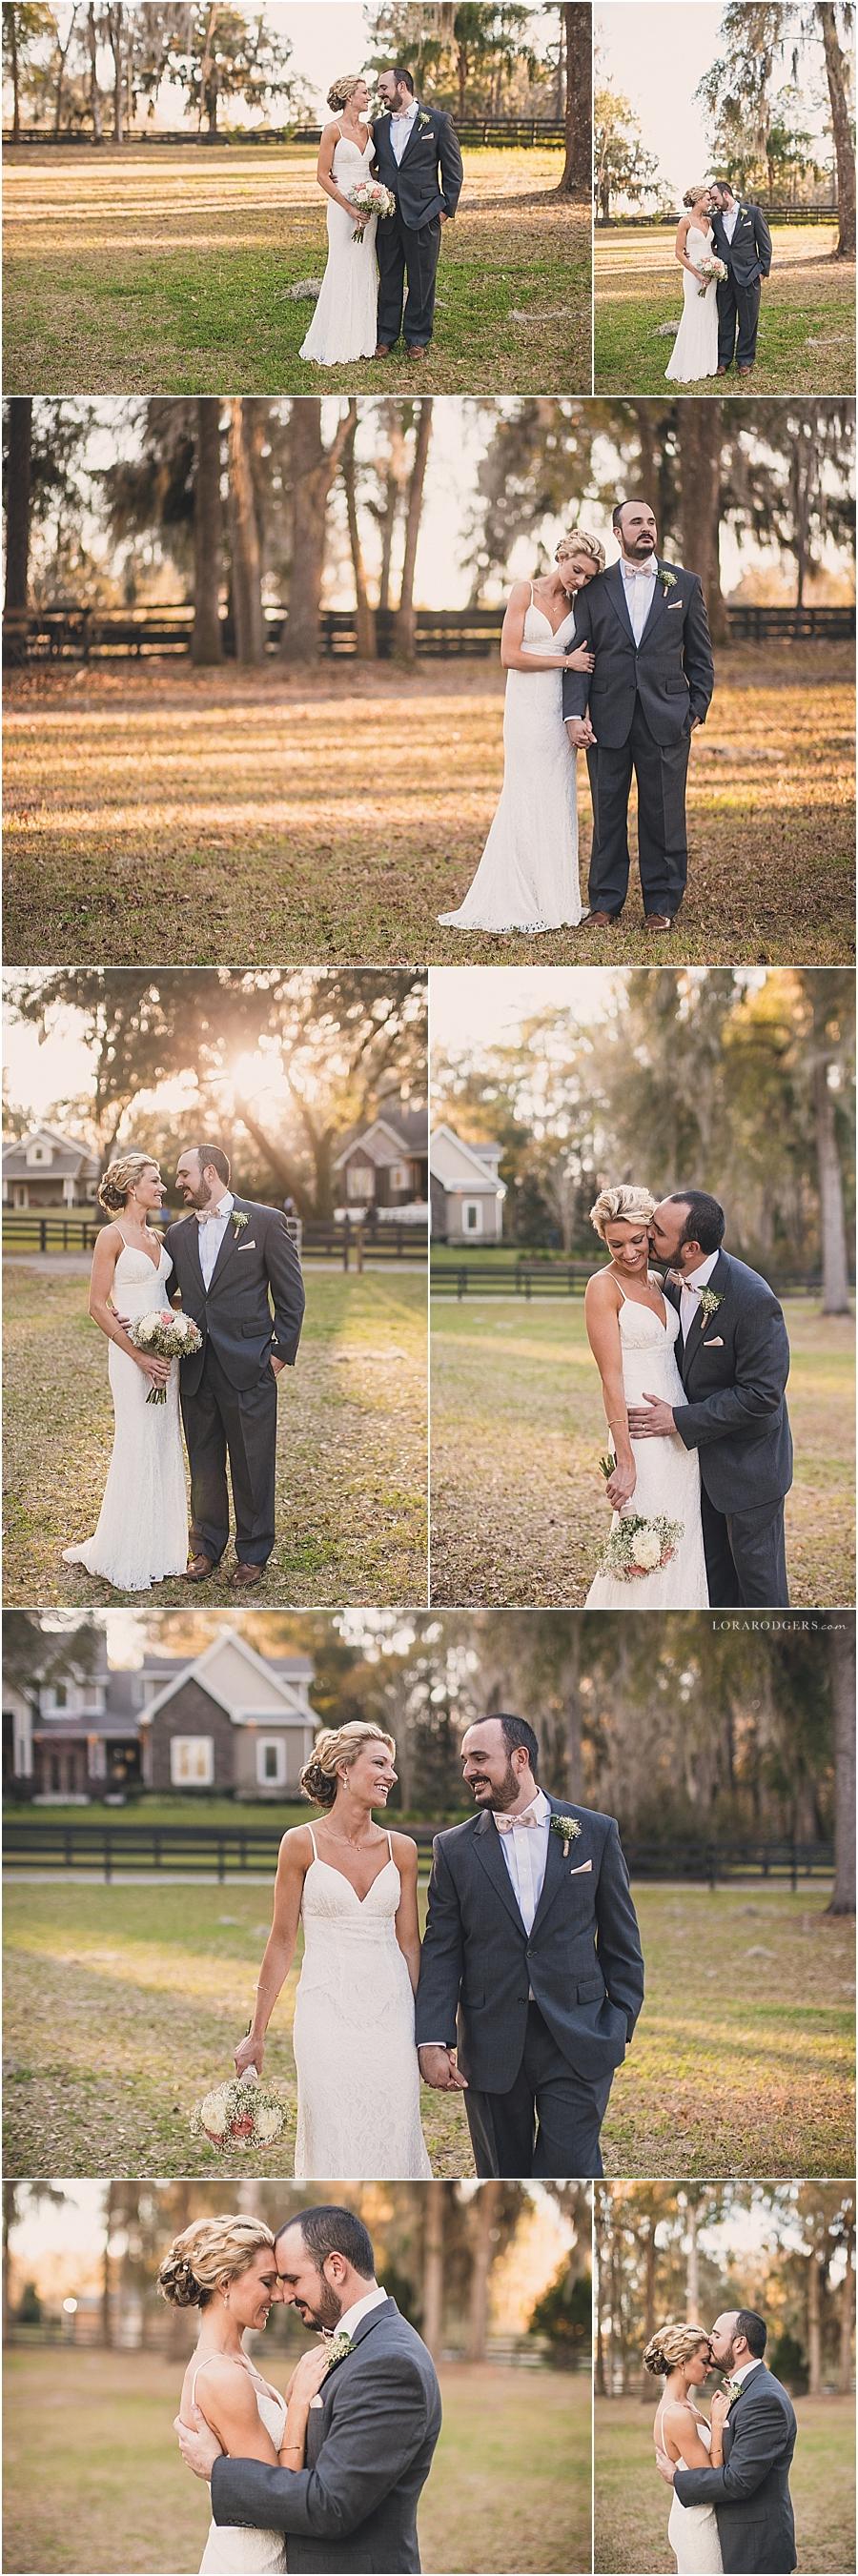 Country_Chic_Ocala_Wedding_010